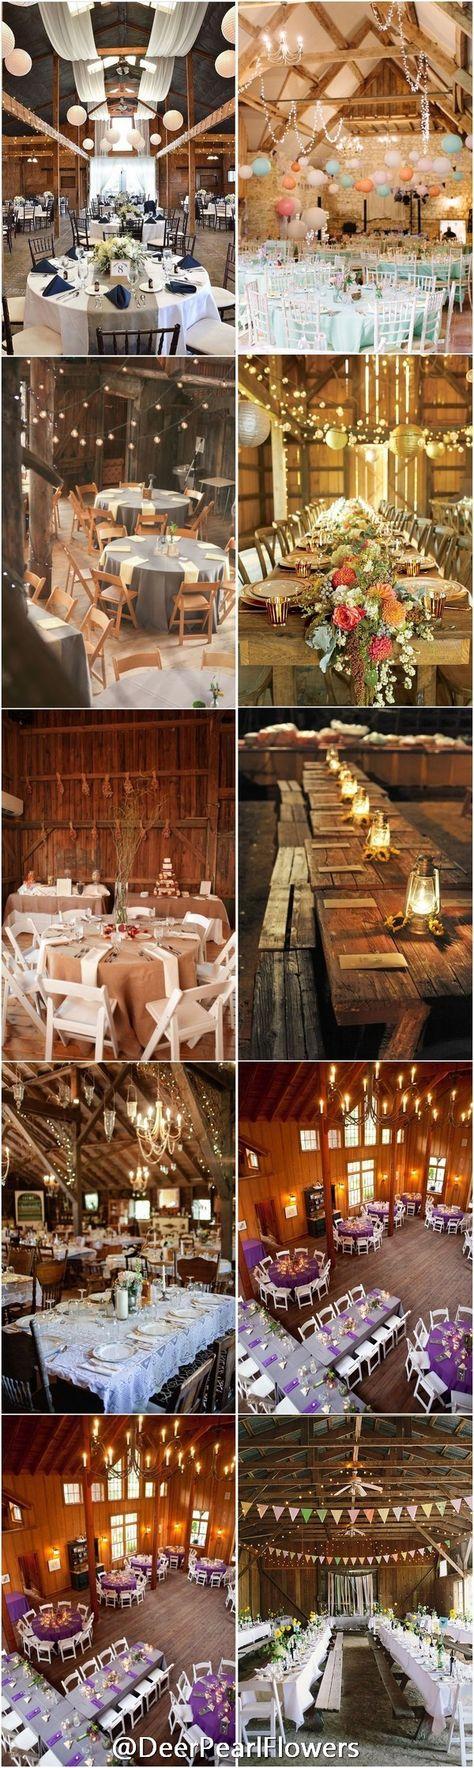 Barn Wedding Reception Table Decoration Ideas / http://www.deerpearlflowers.com/barn-wedding-reception-table-decoration/